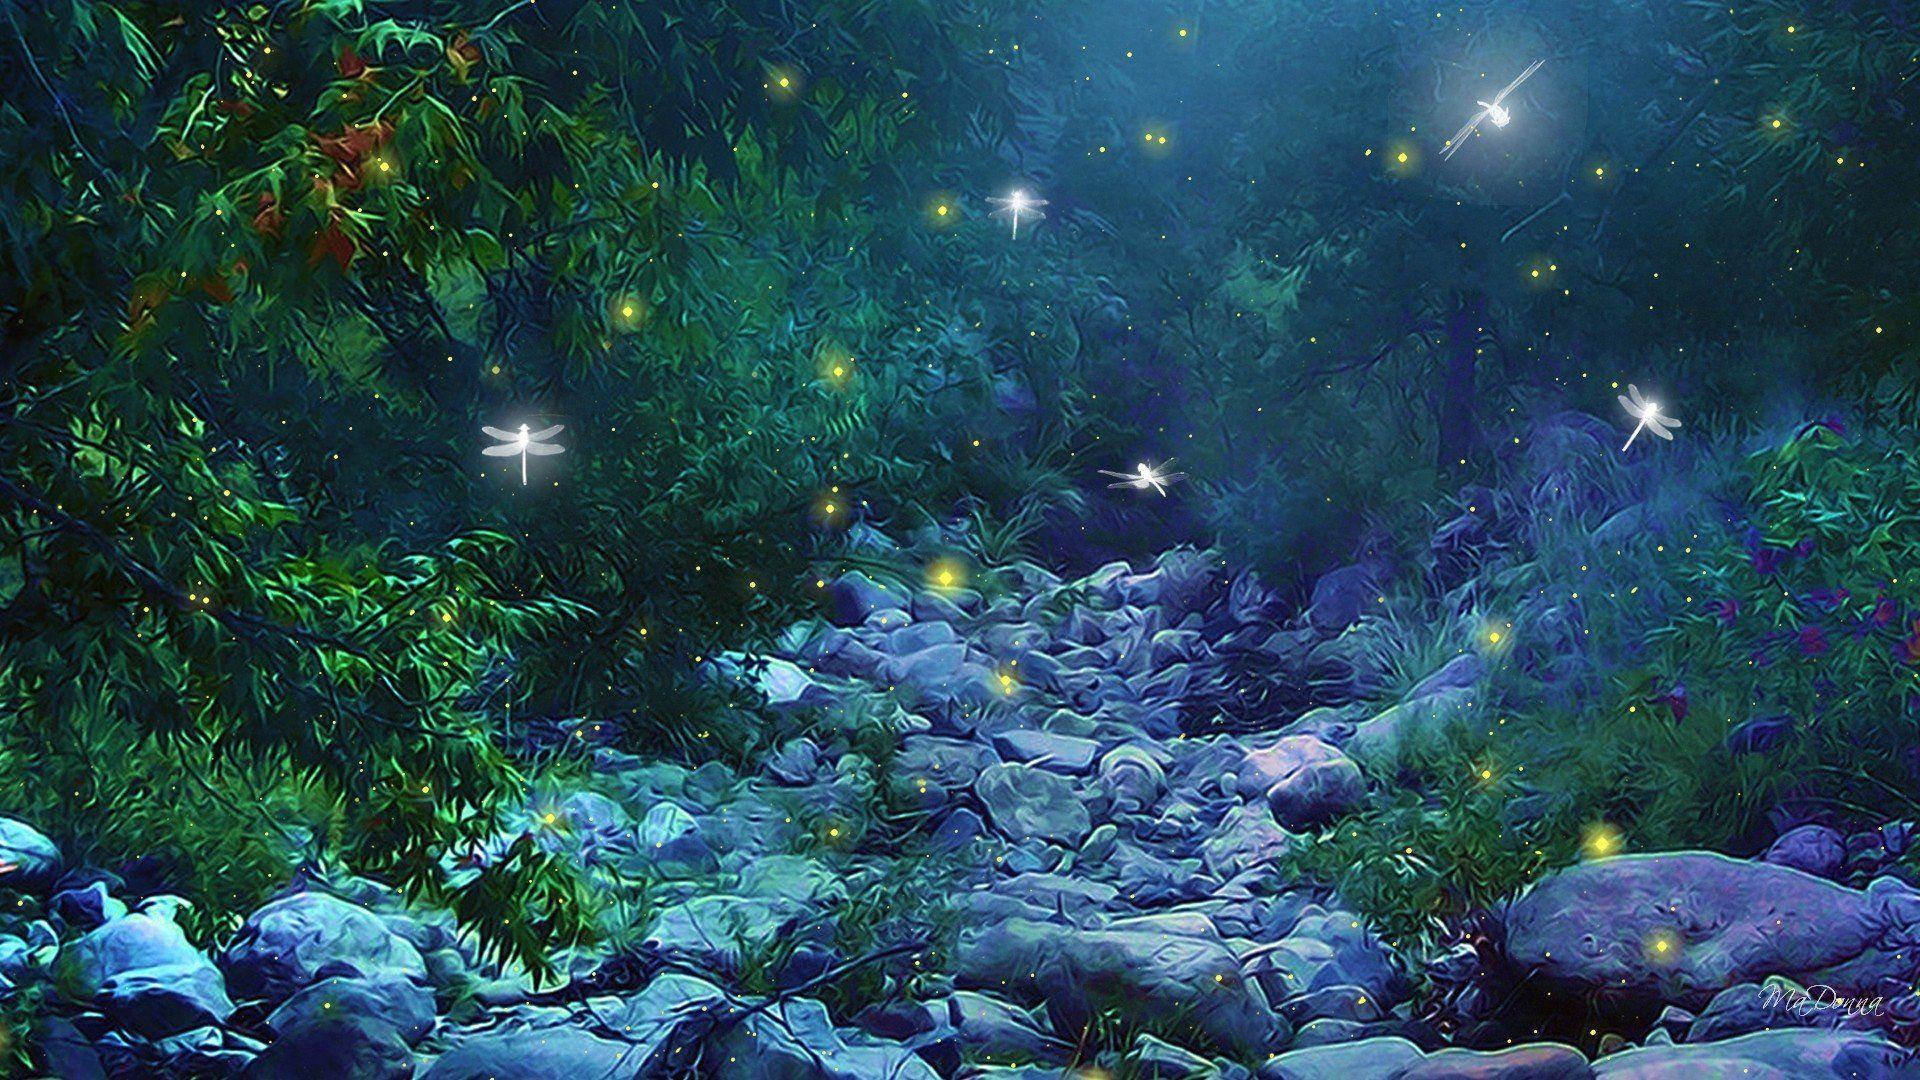 「midsummer Night S Dream Forest」的圖片搜尋結果 Scenery